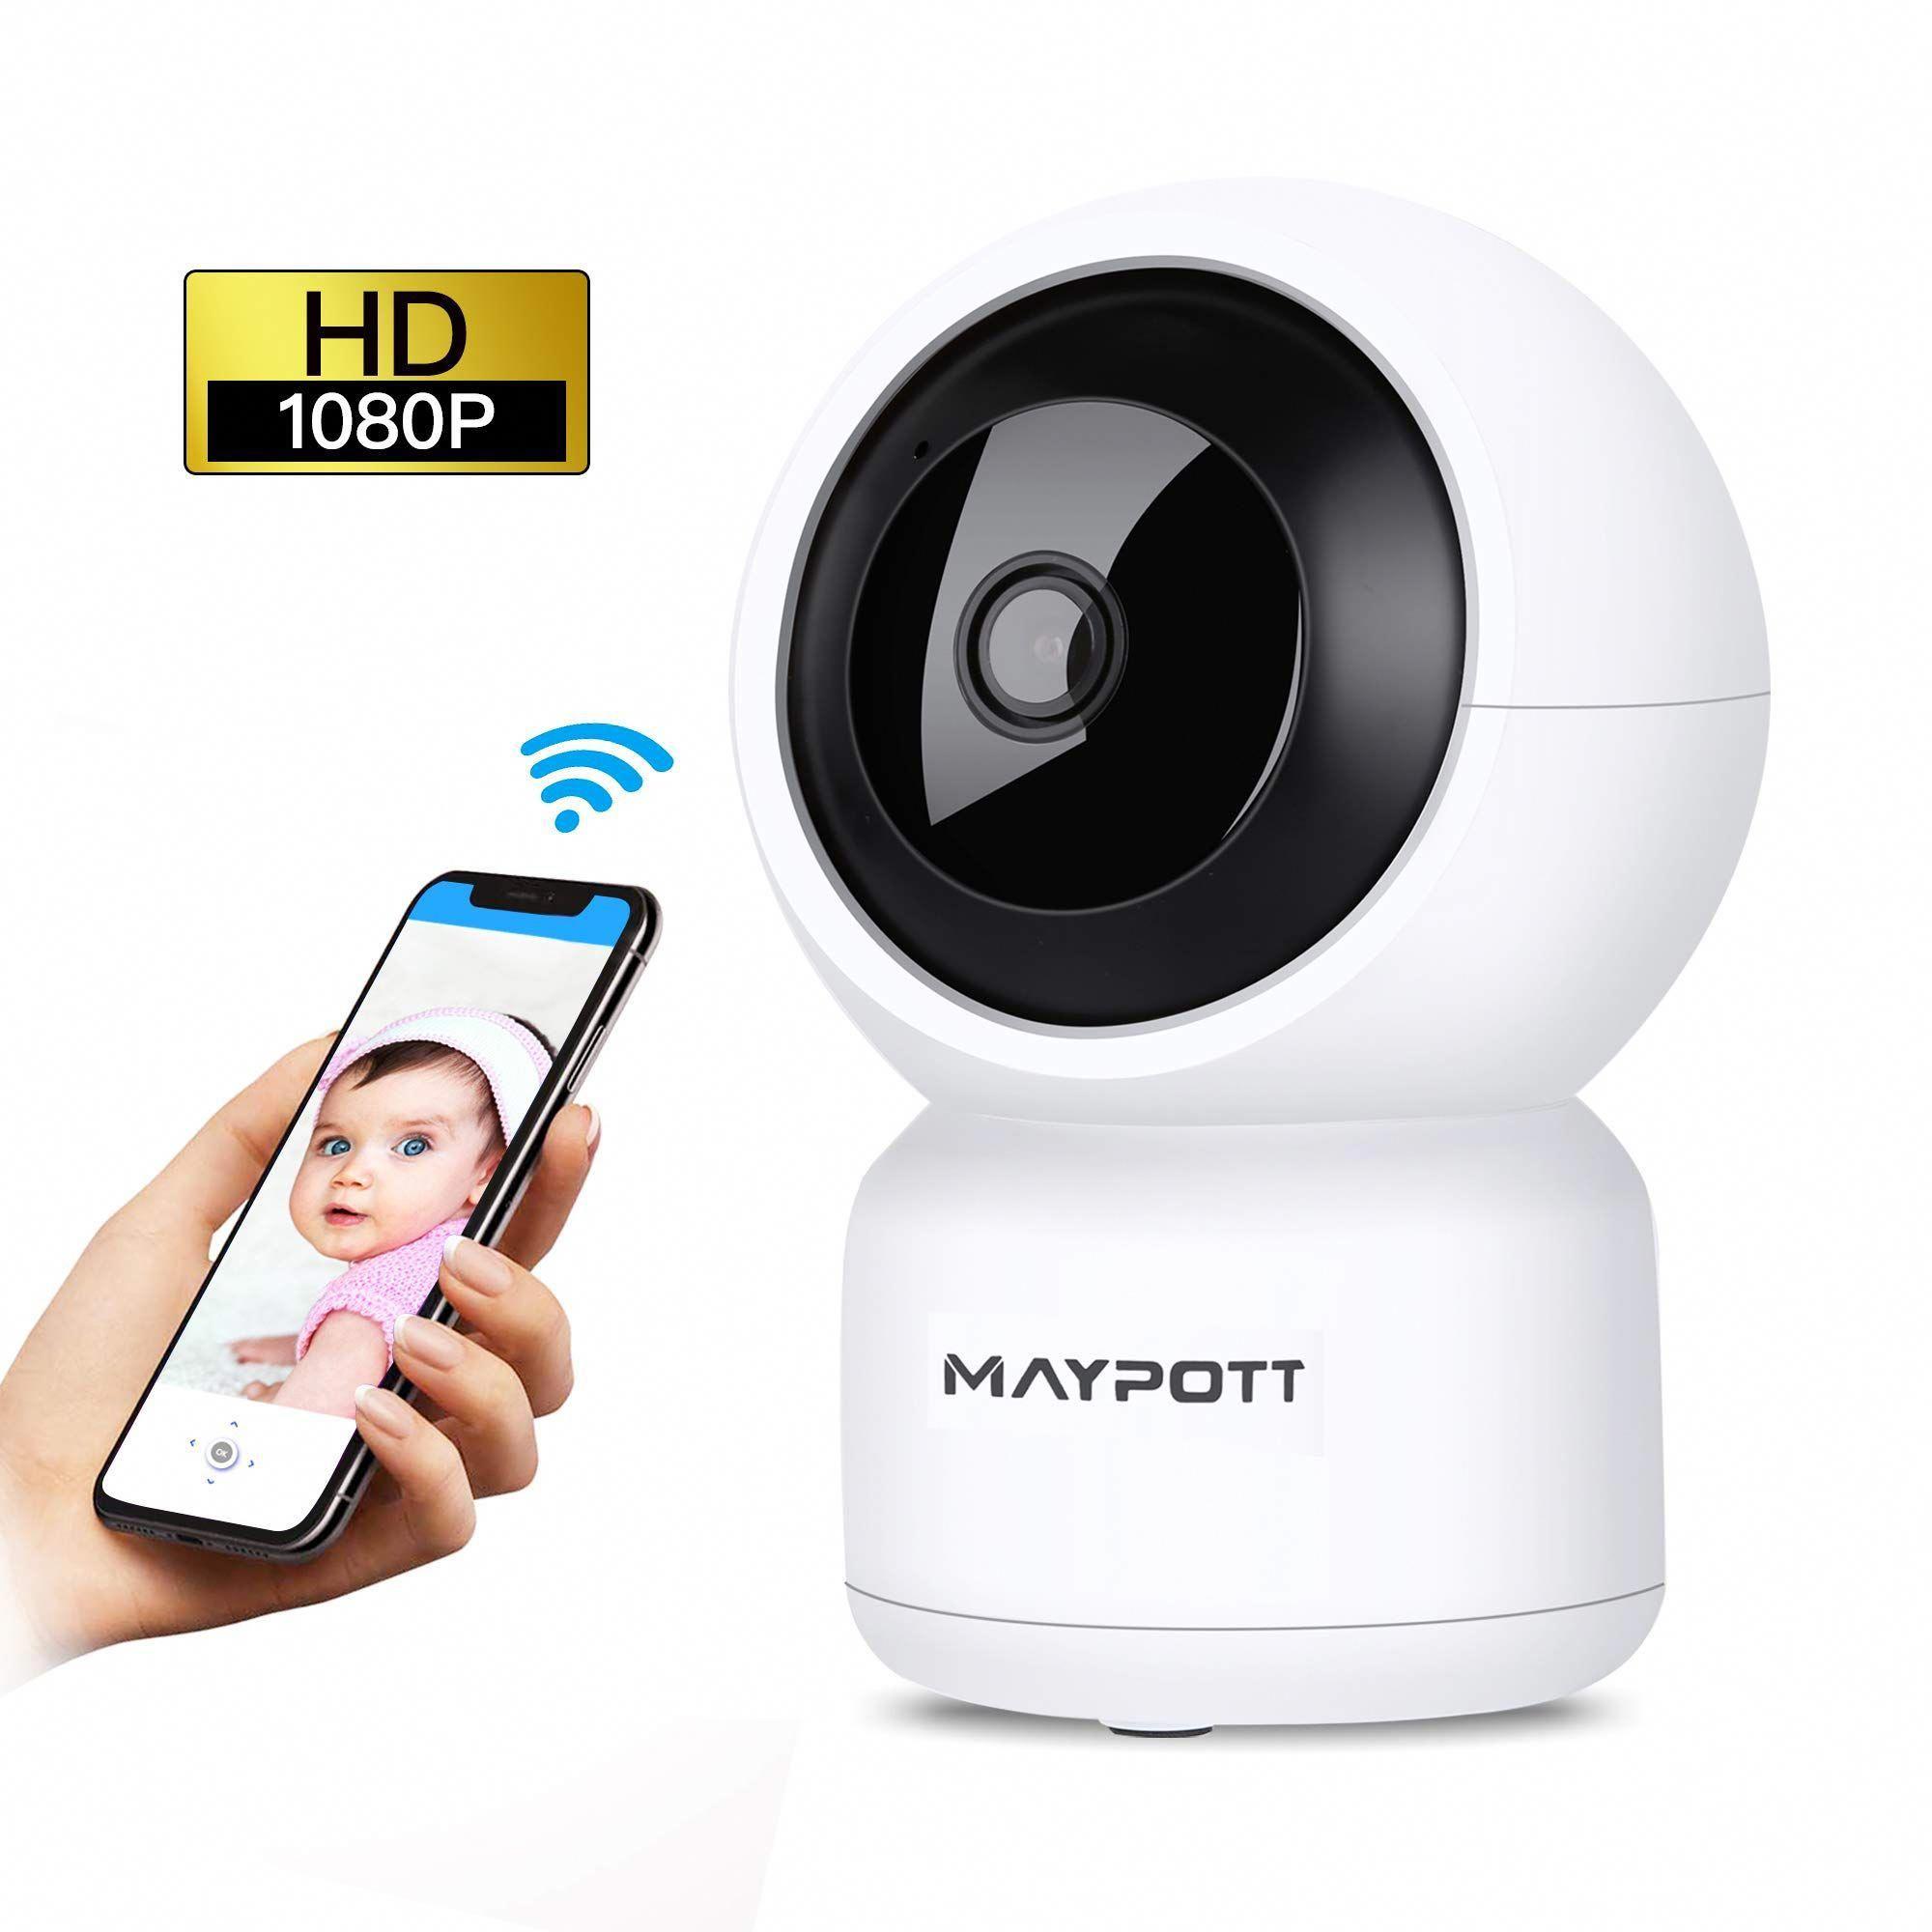 1080P HD Wifi IP Kamera Wireless Security Camera Babyphone Wlan Nachtsicht Alarm